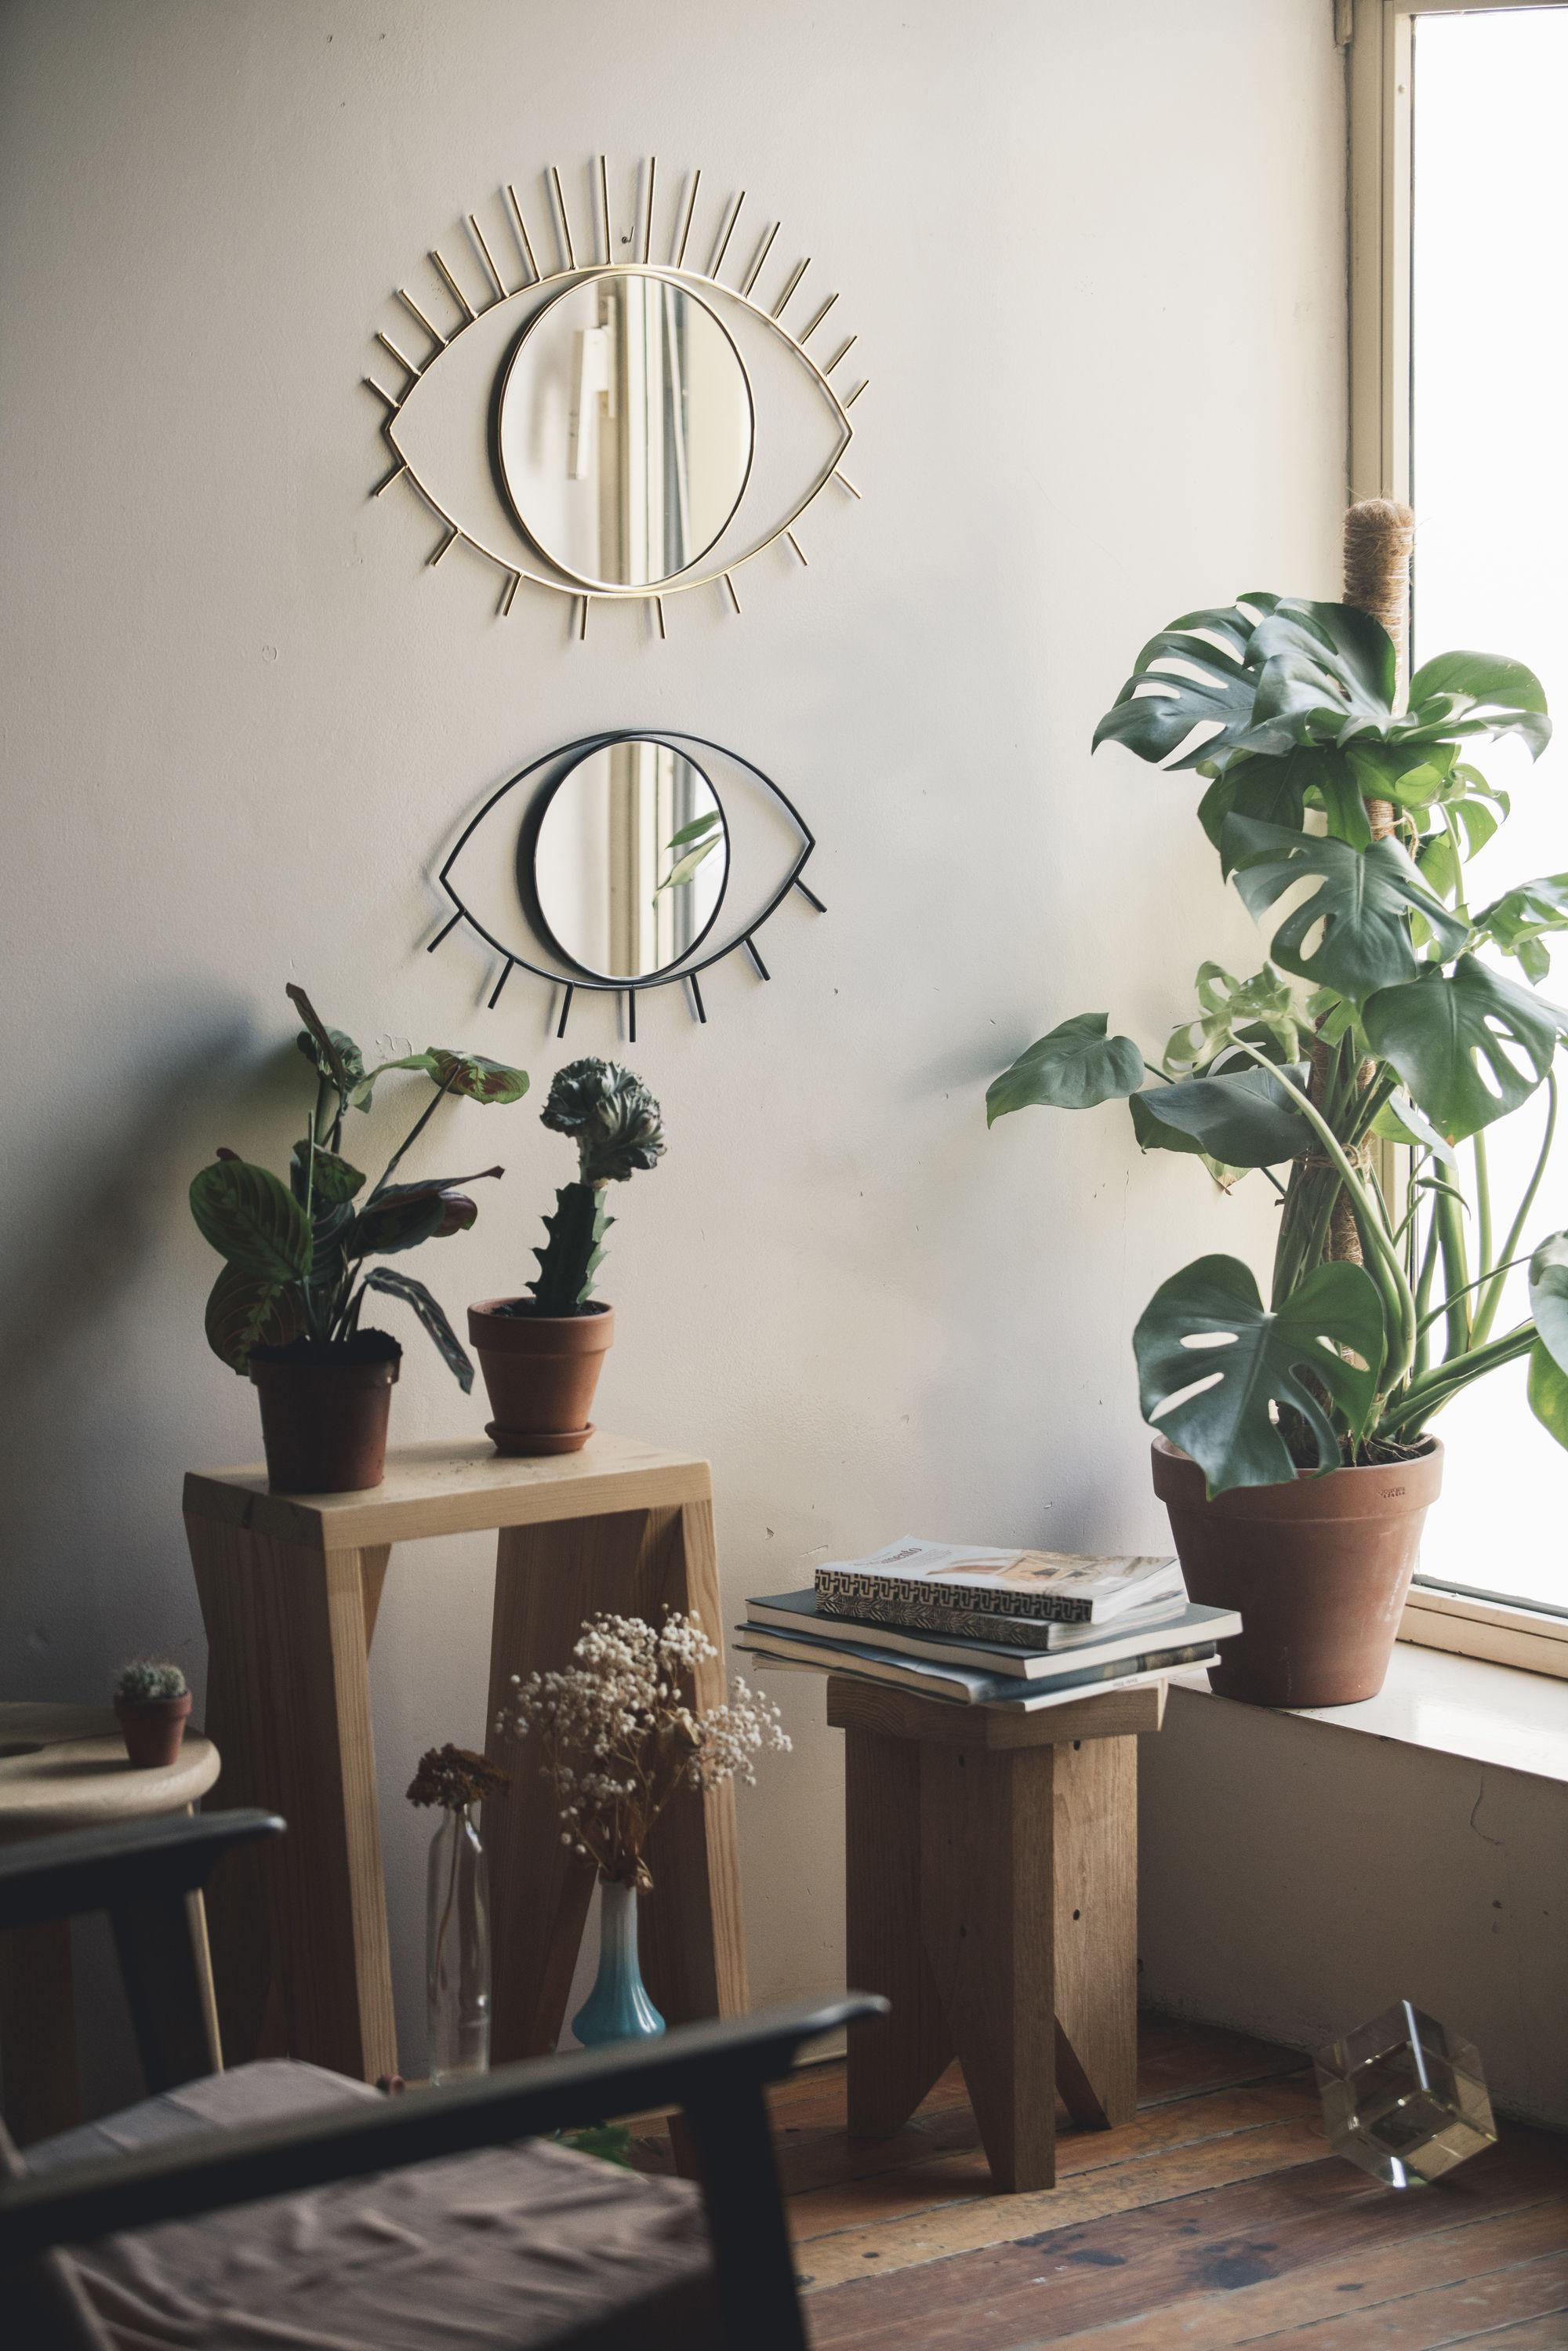 miroir mural cyclops medium doiy medium noir l 43 x h 28 made in design. Black Bedroom Furniture Sets. Home Design Ideas